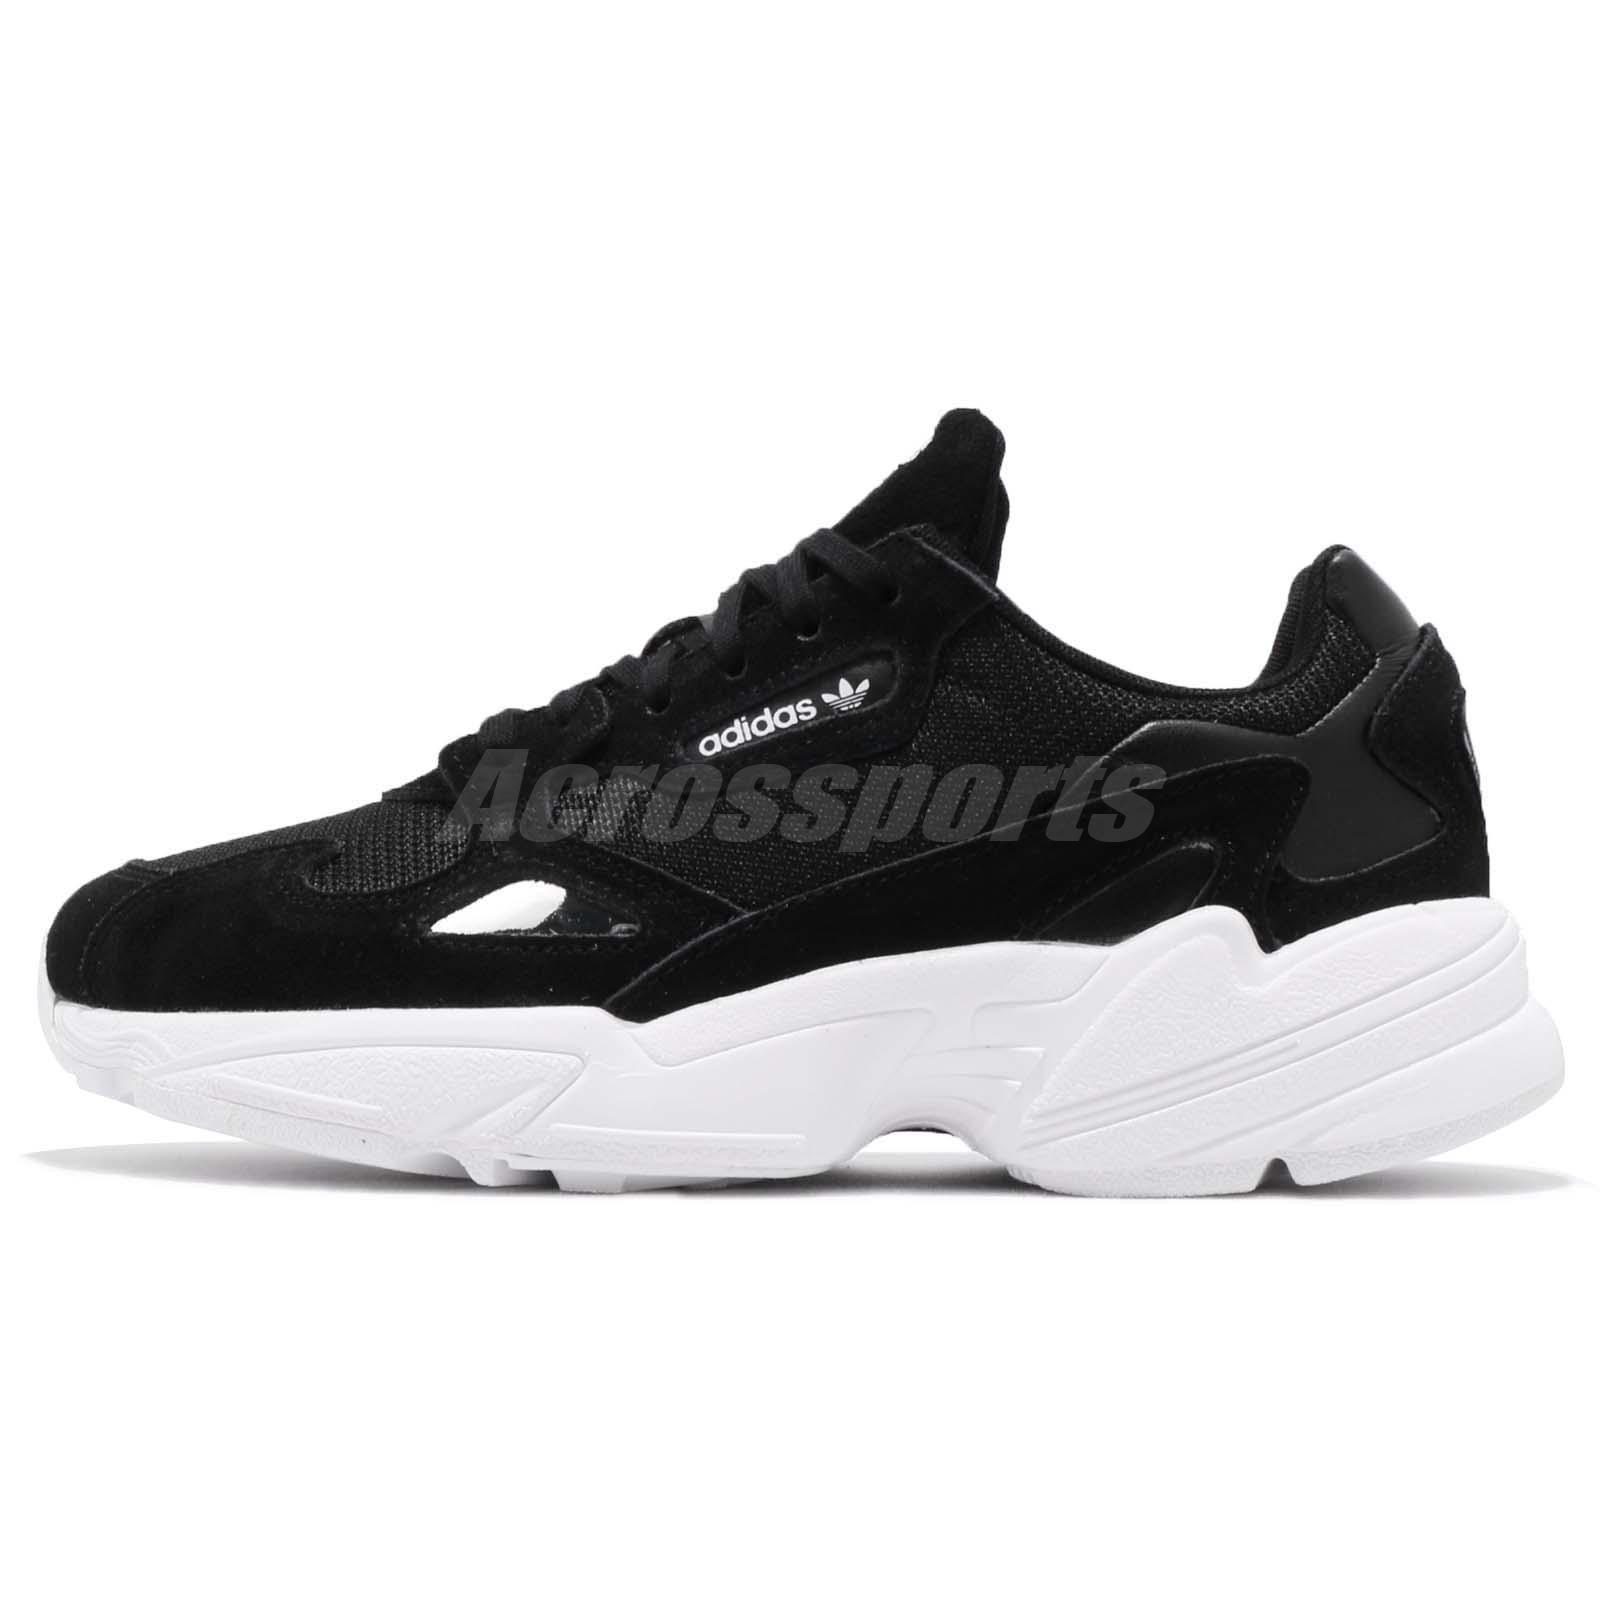 Labe Año nuevo regla  adidas Originals Falcon W Black White Womens Shoes Chunky Sneakers B28129 |  eBay